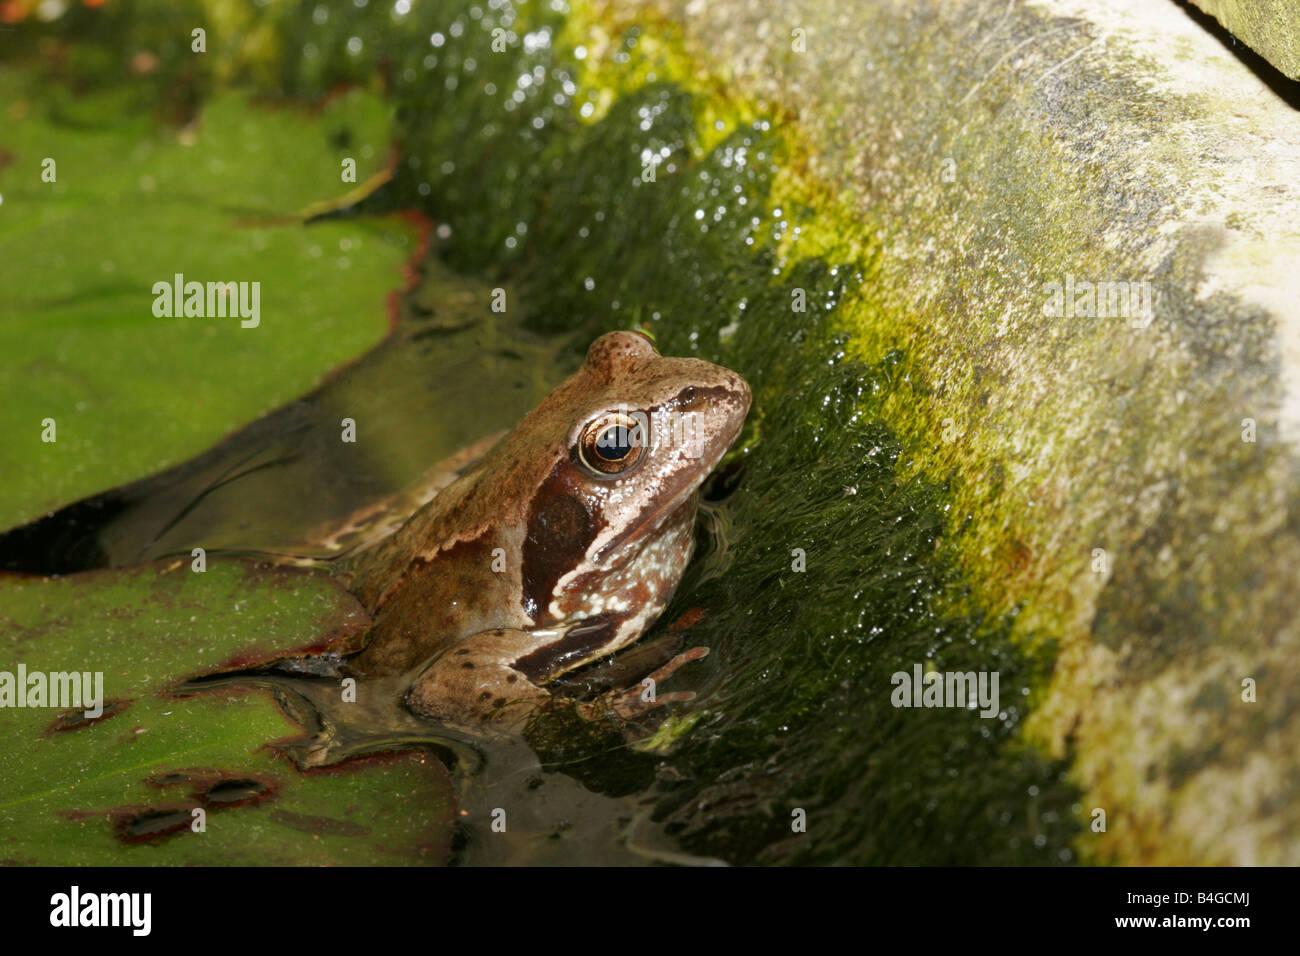 Common Frog Rana temporaria single adult resting in garden pond at night Taken June London UK - Stock Image